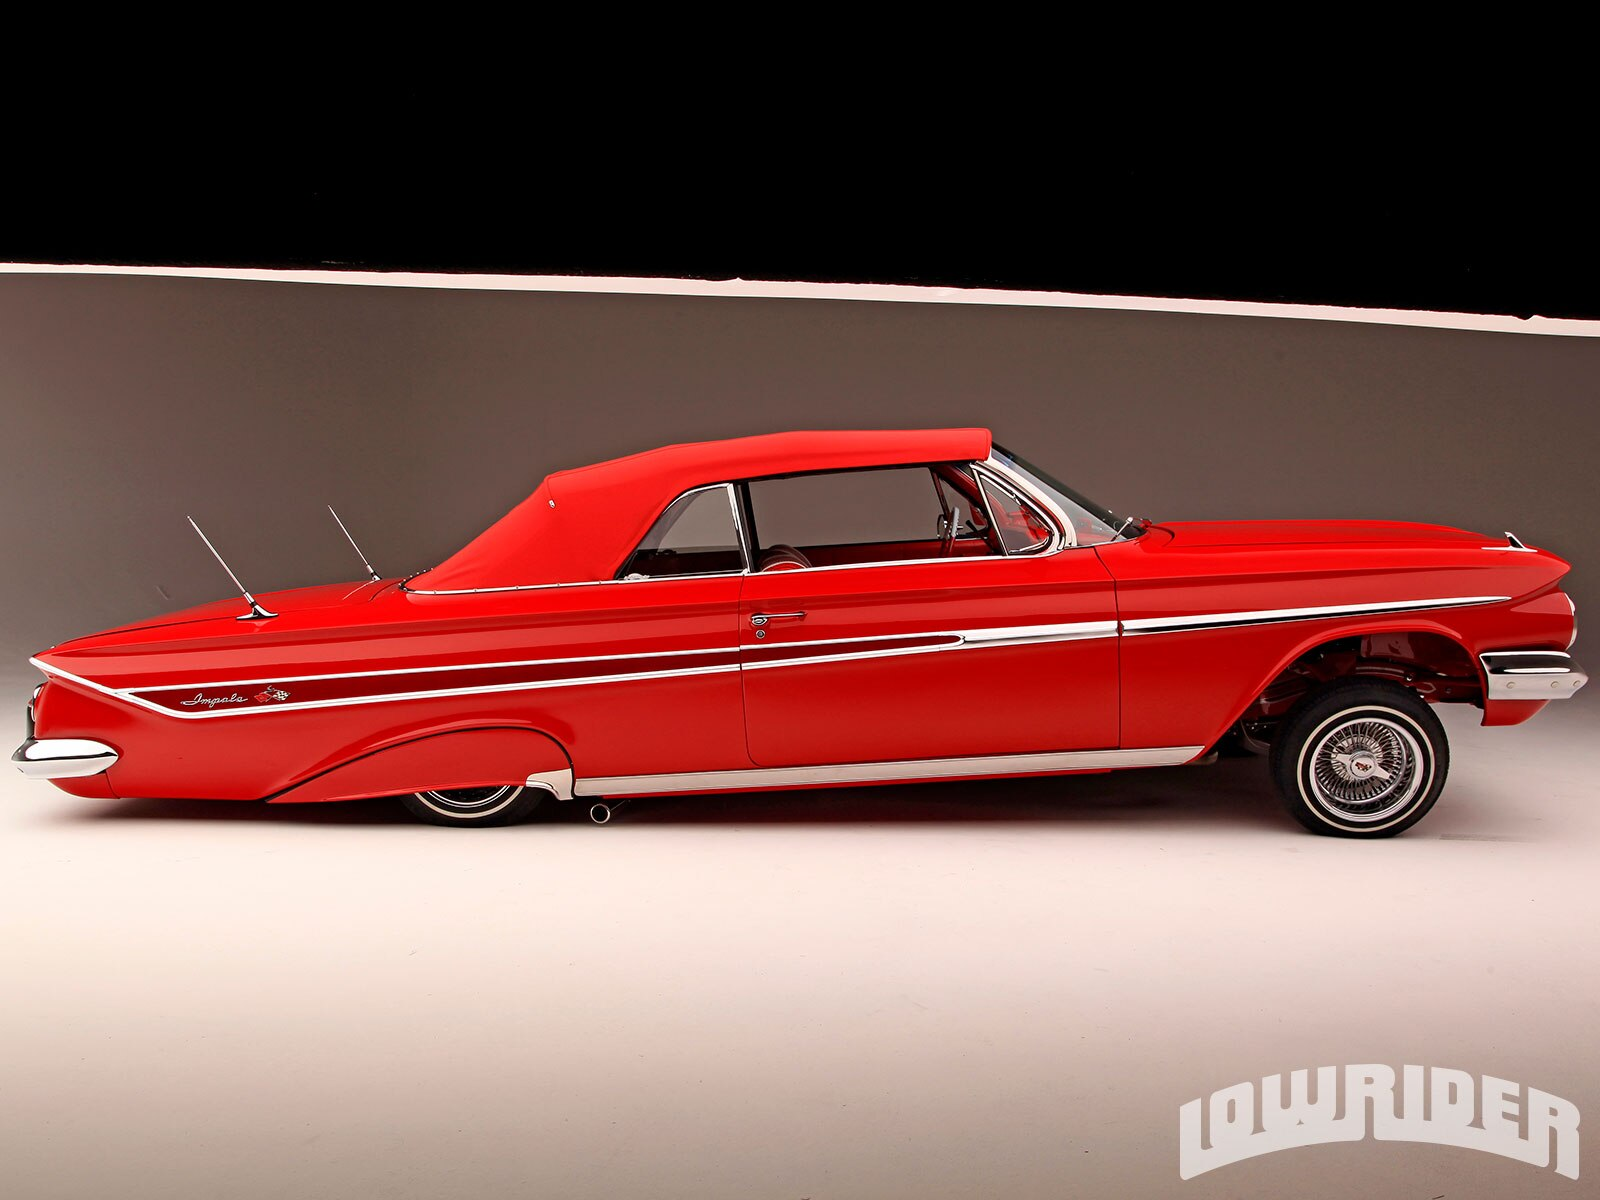 hight resolution of 1961 chevrolet impala nyc rotten apple